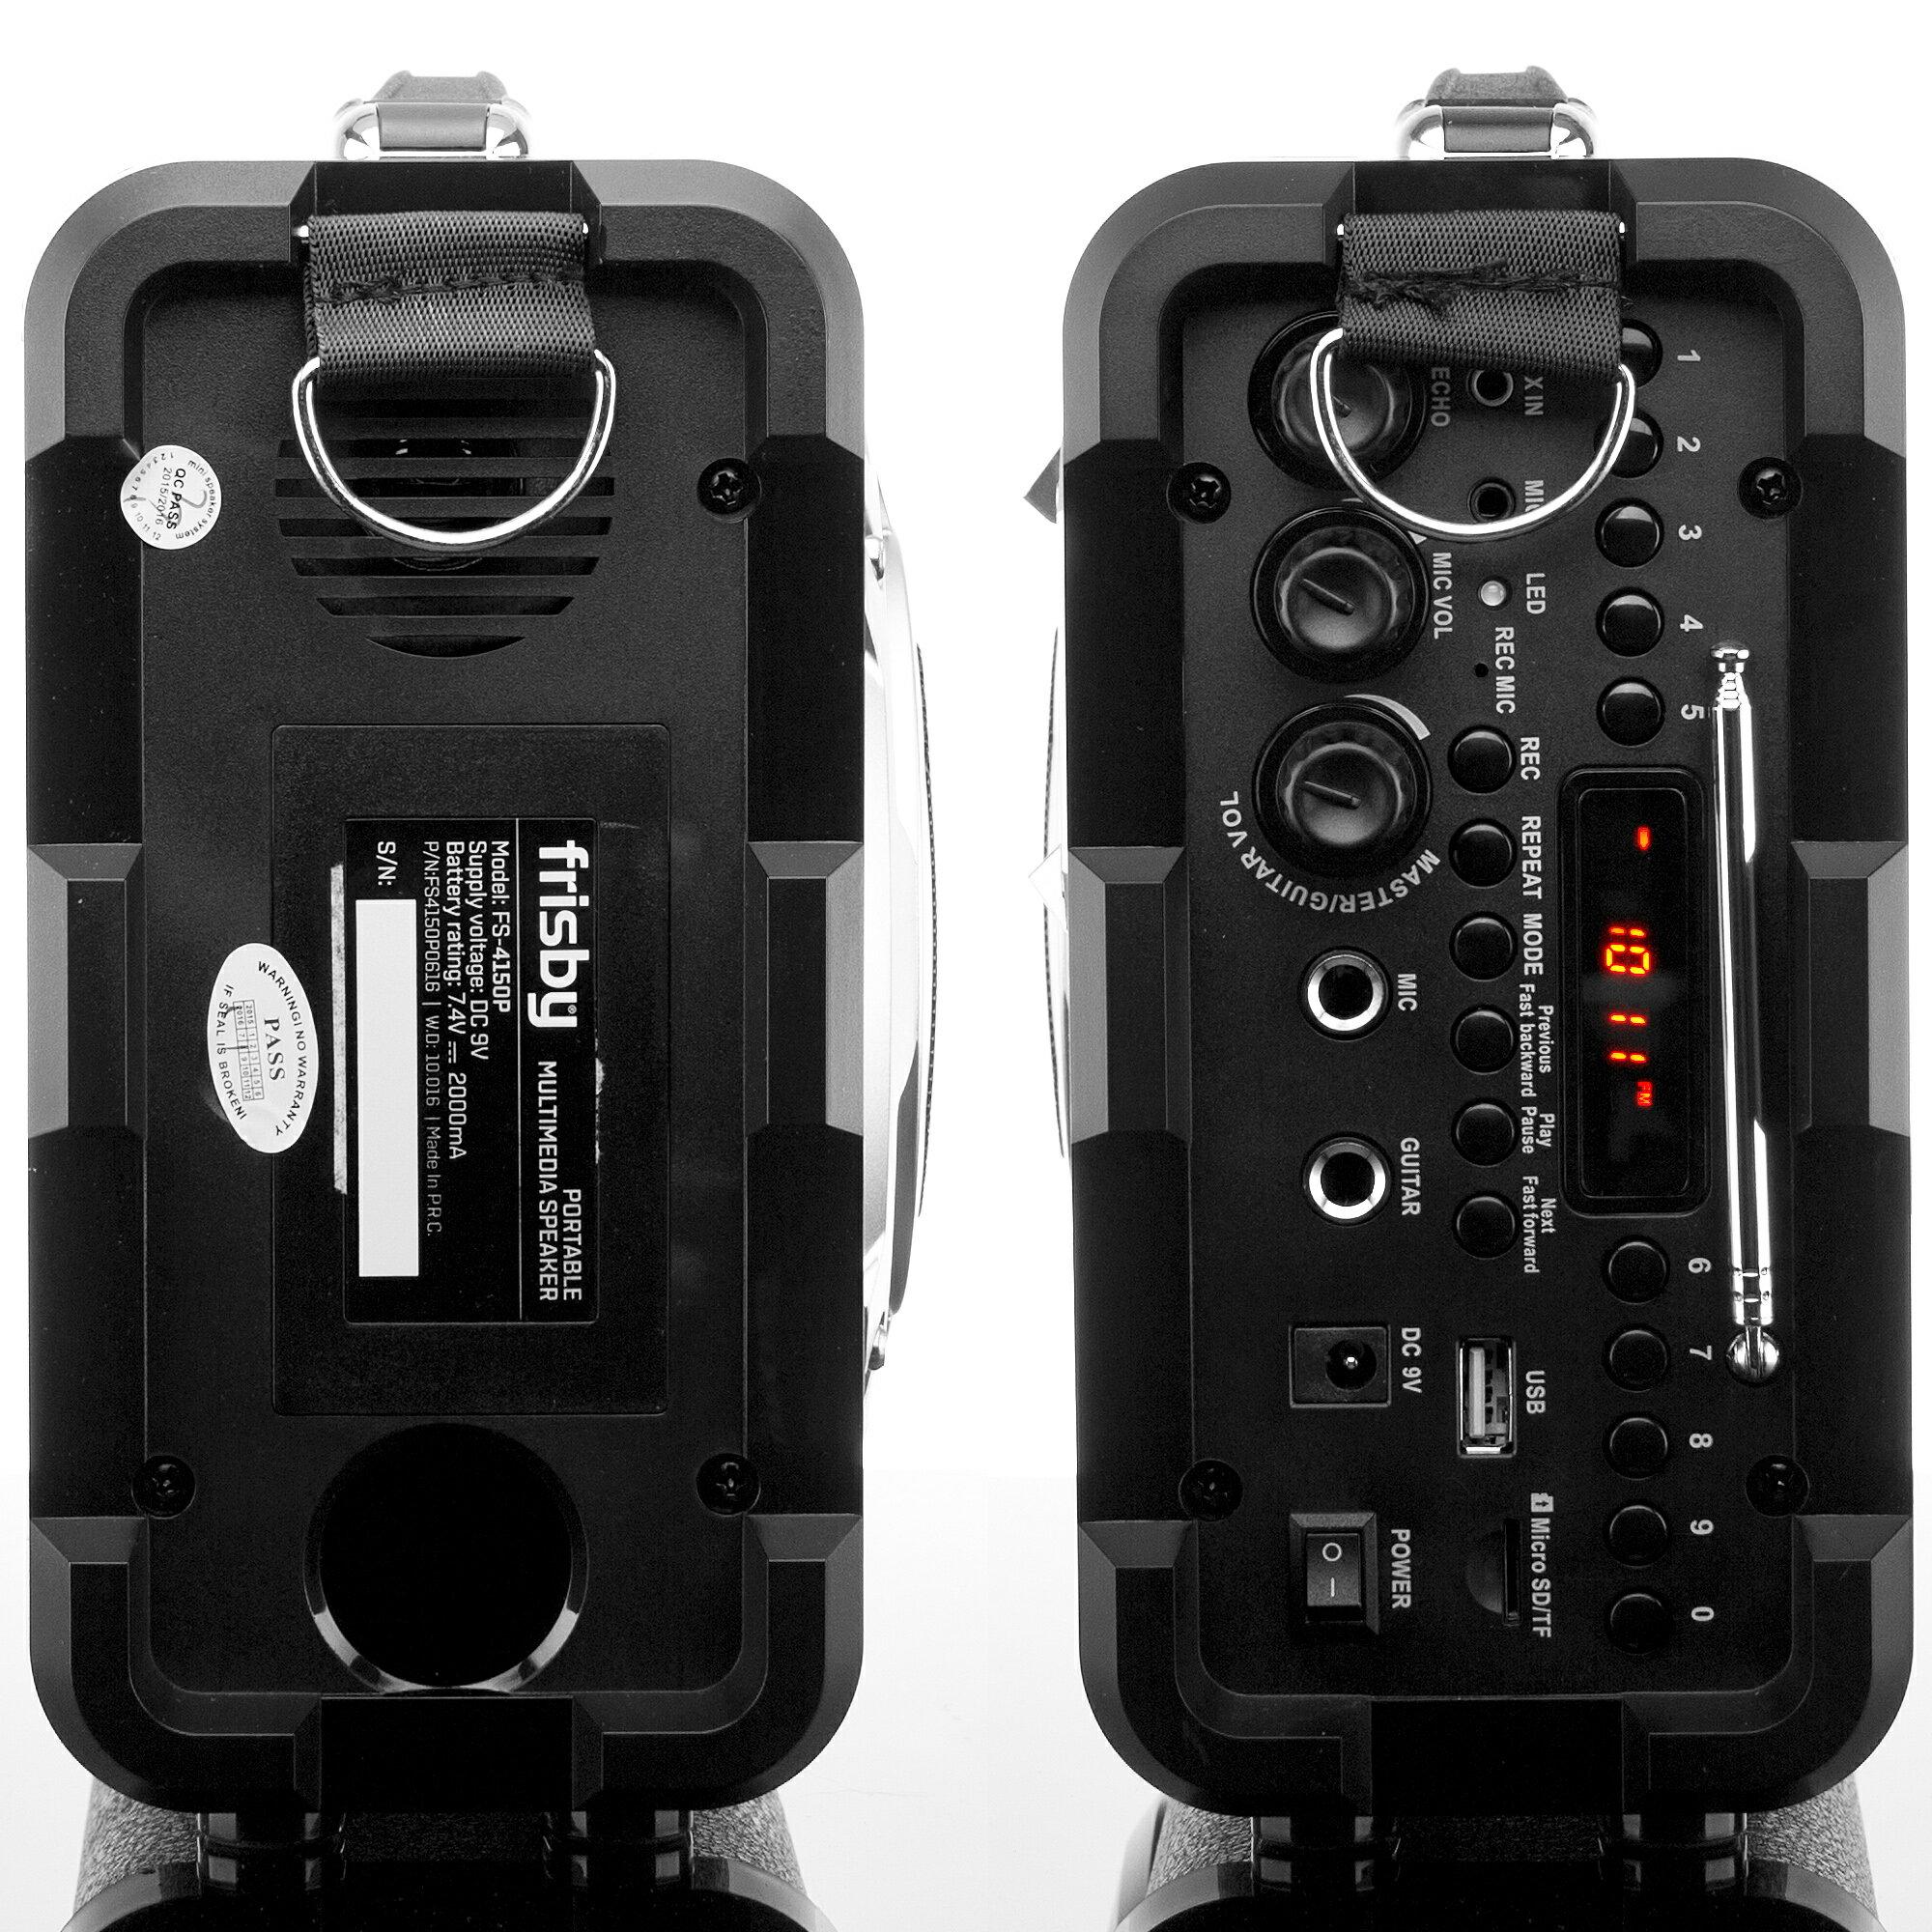 Frisby FS-4150P Bluetooth Karaoke Hi-Fi PA Portable Rechargeable Multimedia Speaker System w/ Mics 5